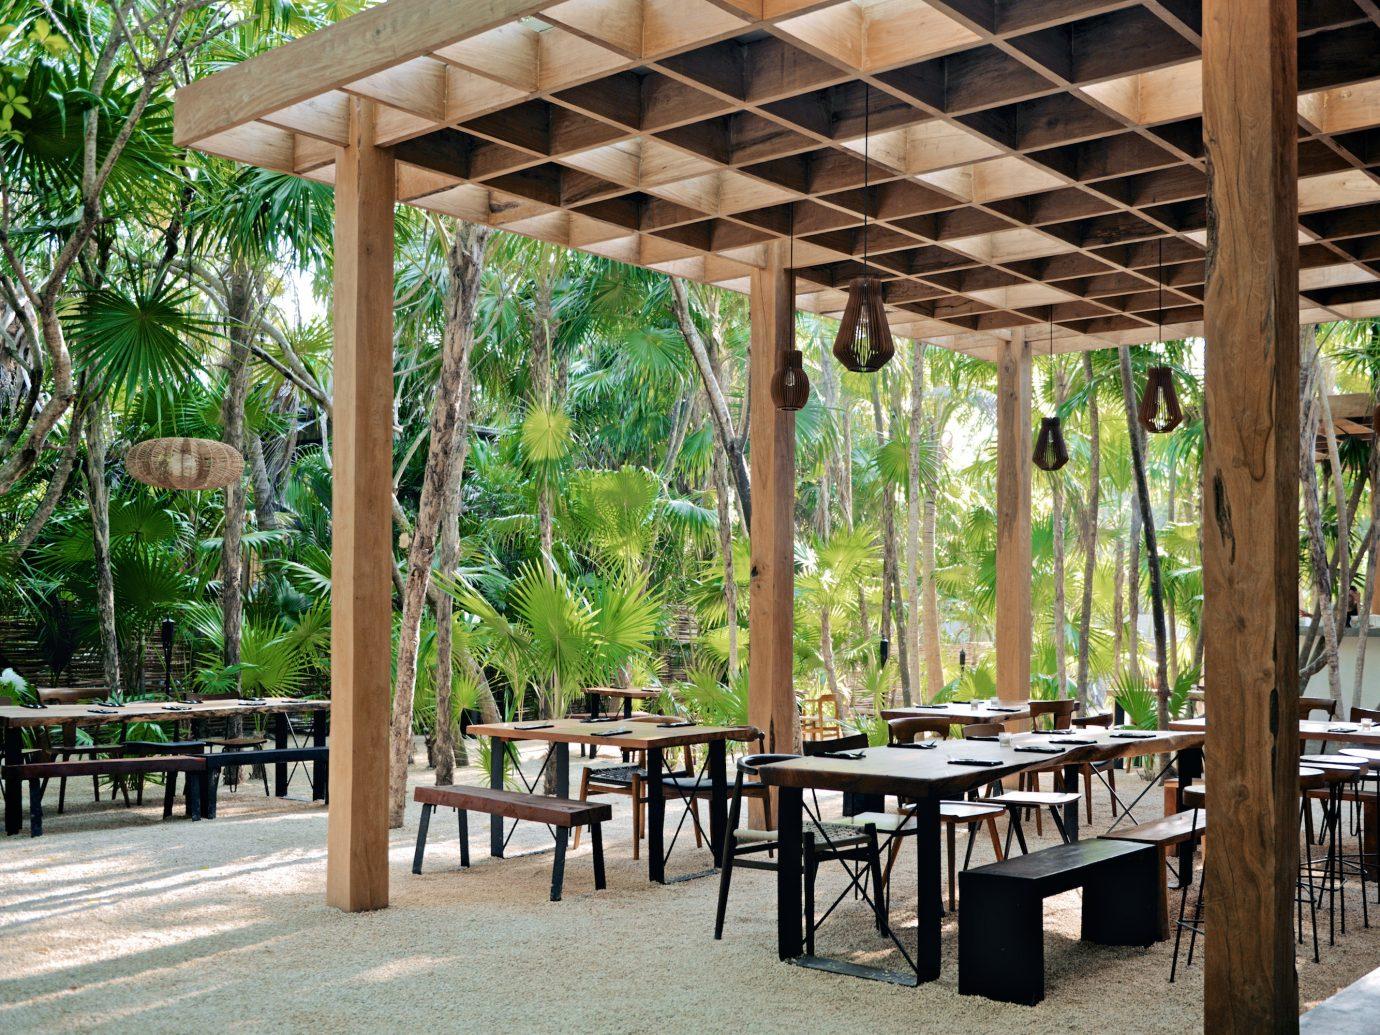 City Mexico Trip Ideas Tulum plant tree Resort outdoor structure pavilion table pergola Patio leisure arecales gazebo